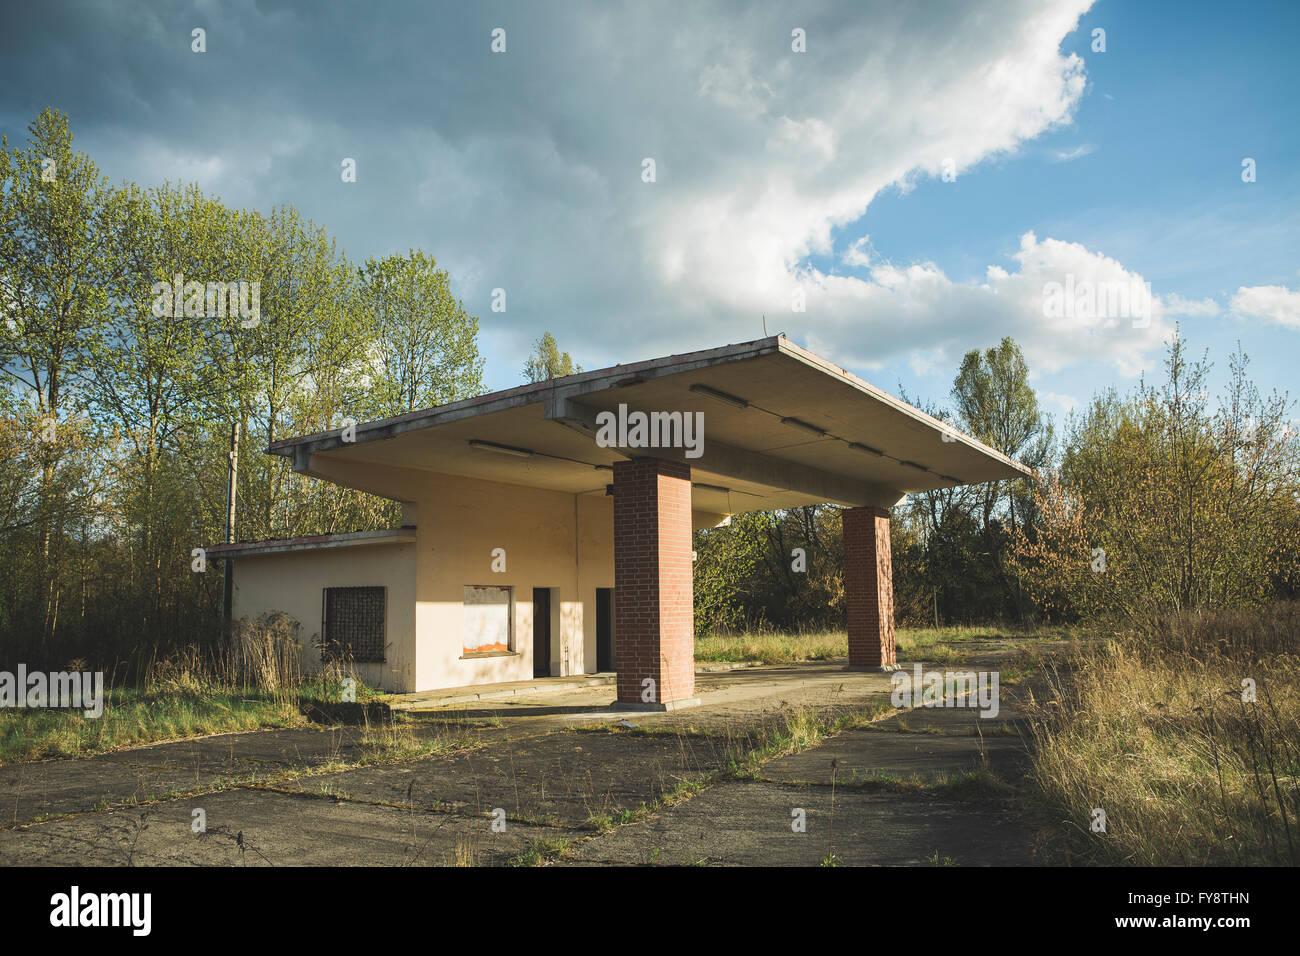 Old petrol station - Stock Image